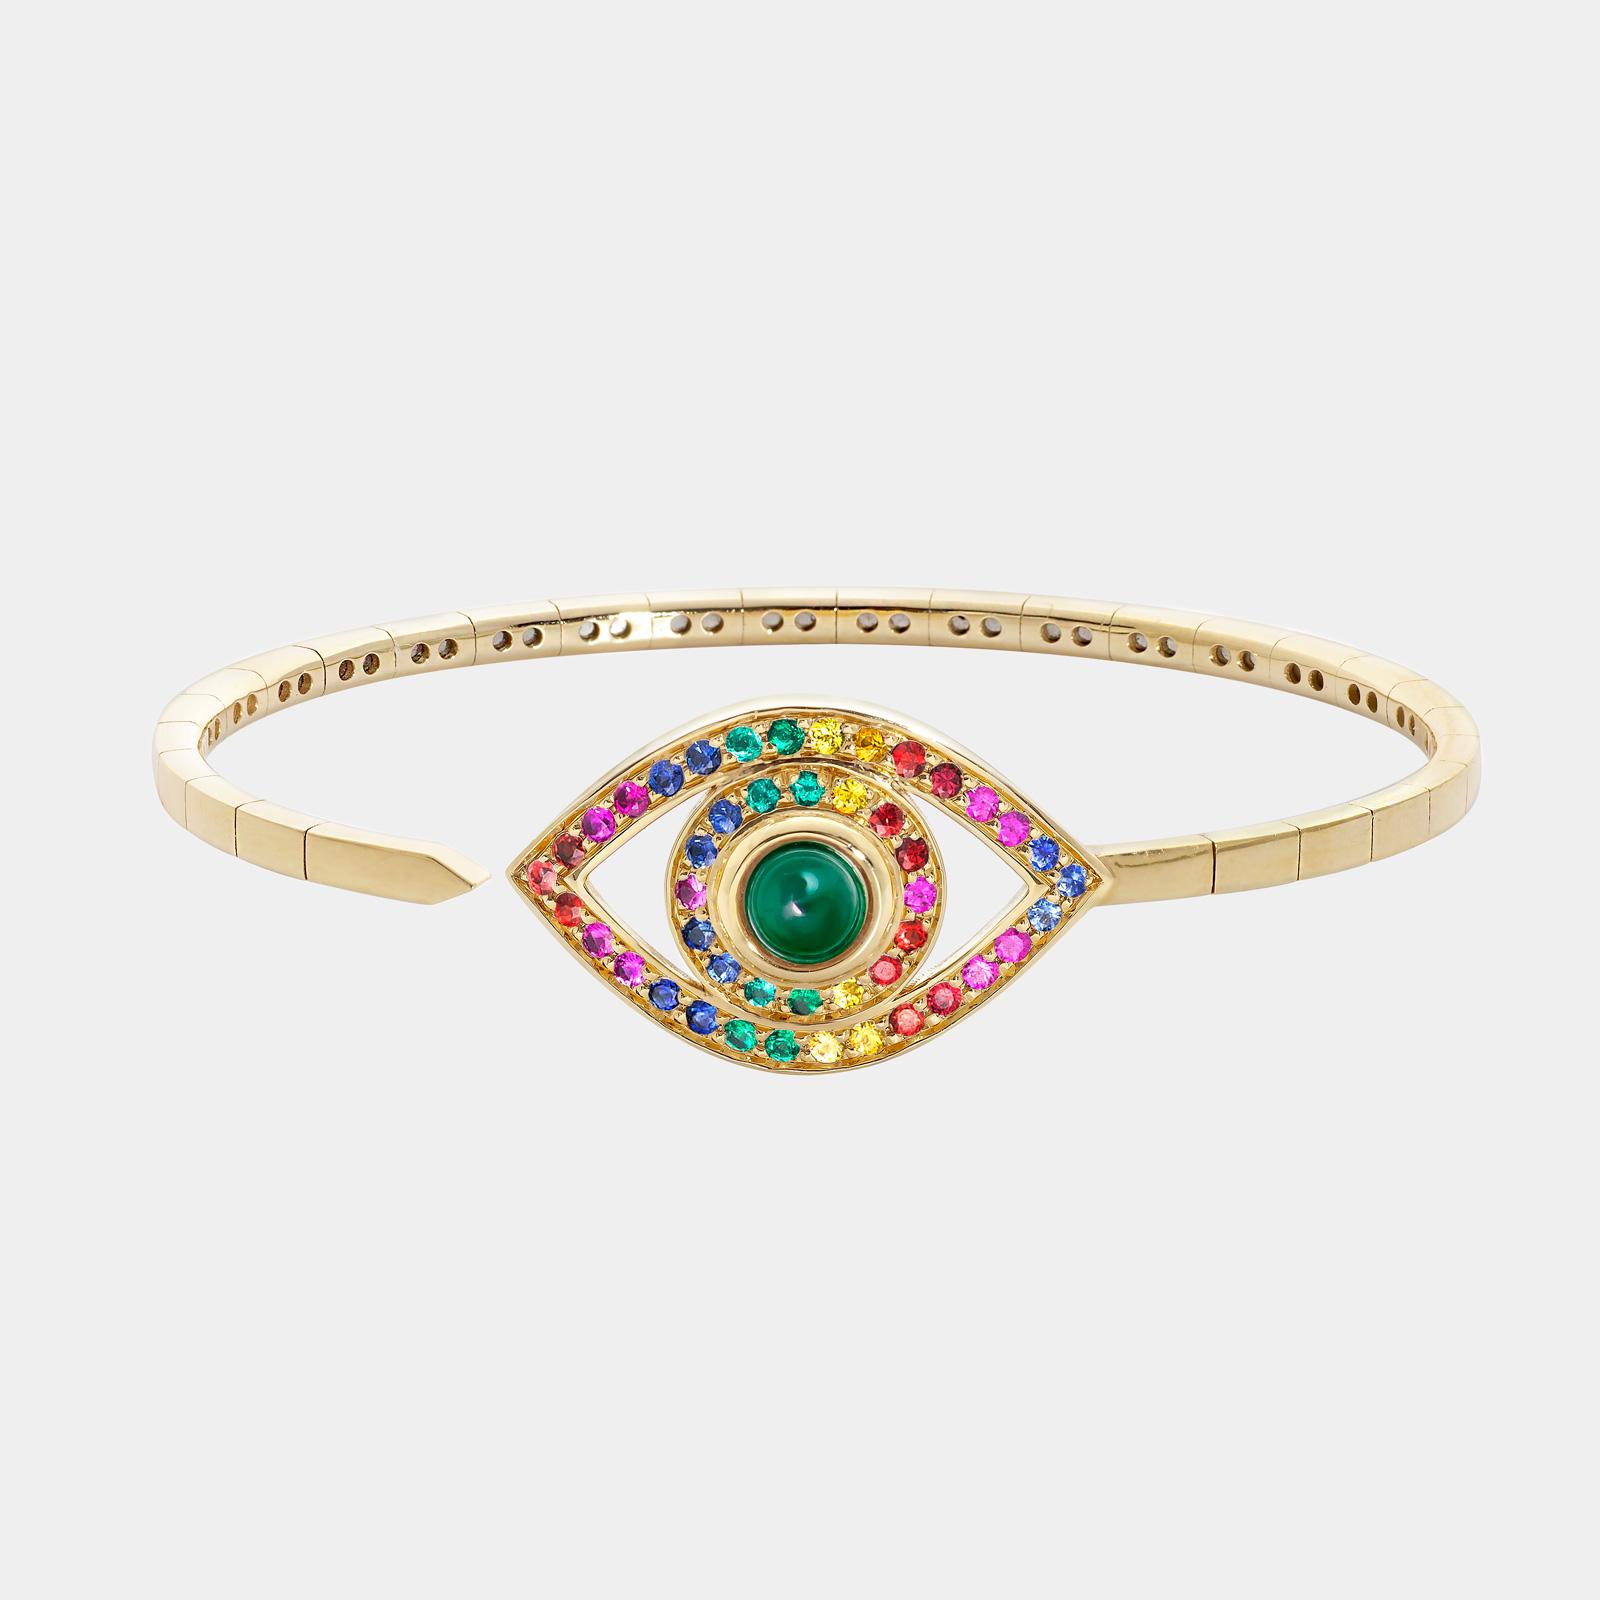 Netali Nissim - Bracciale Big Eye | Rosanna Cattolico gioielli